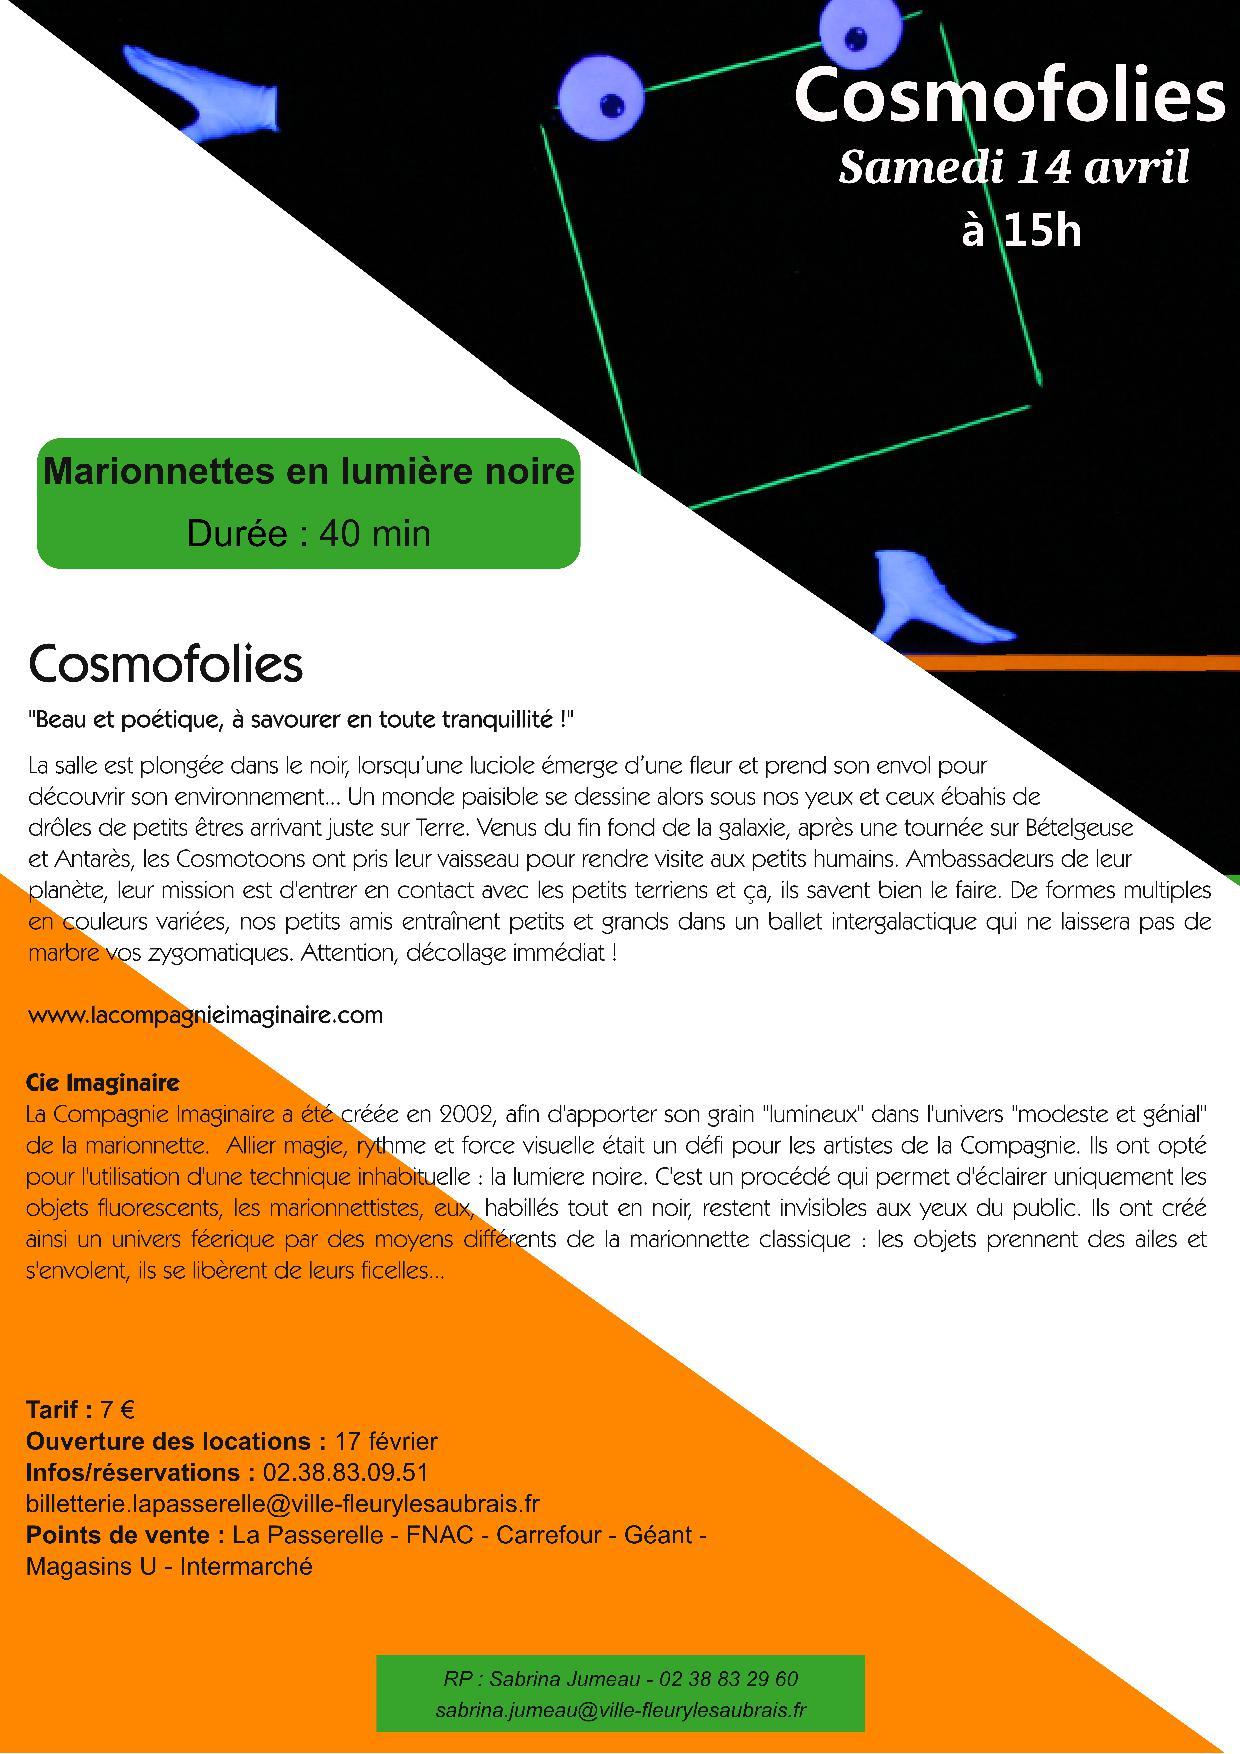 C_Users_Jose_Downloads_Cosmofolies.jpg